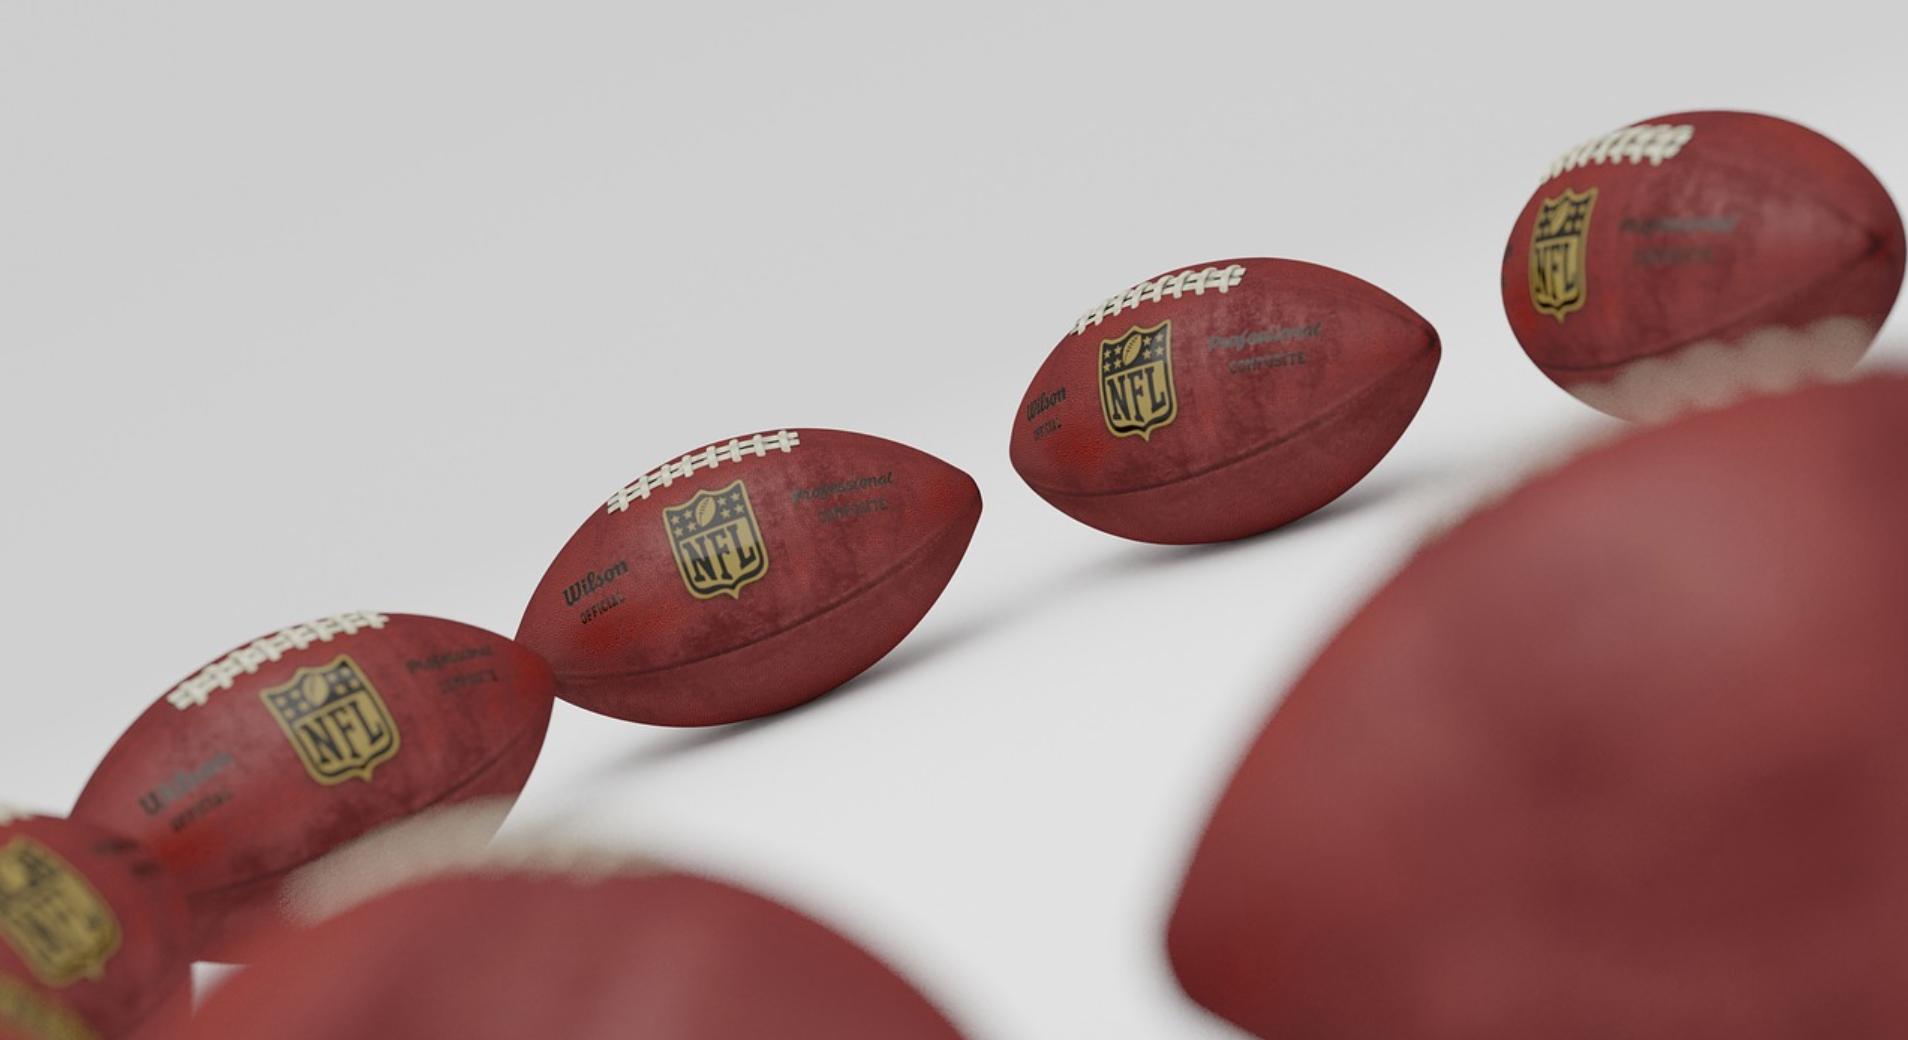 Superbowl deals and discounts 2021: image of NFL footballs